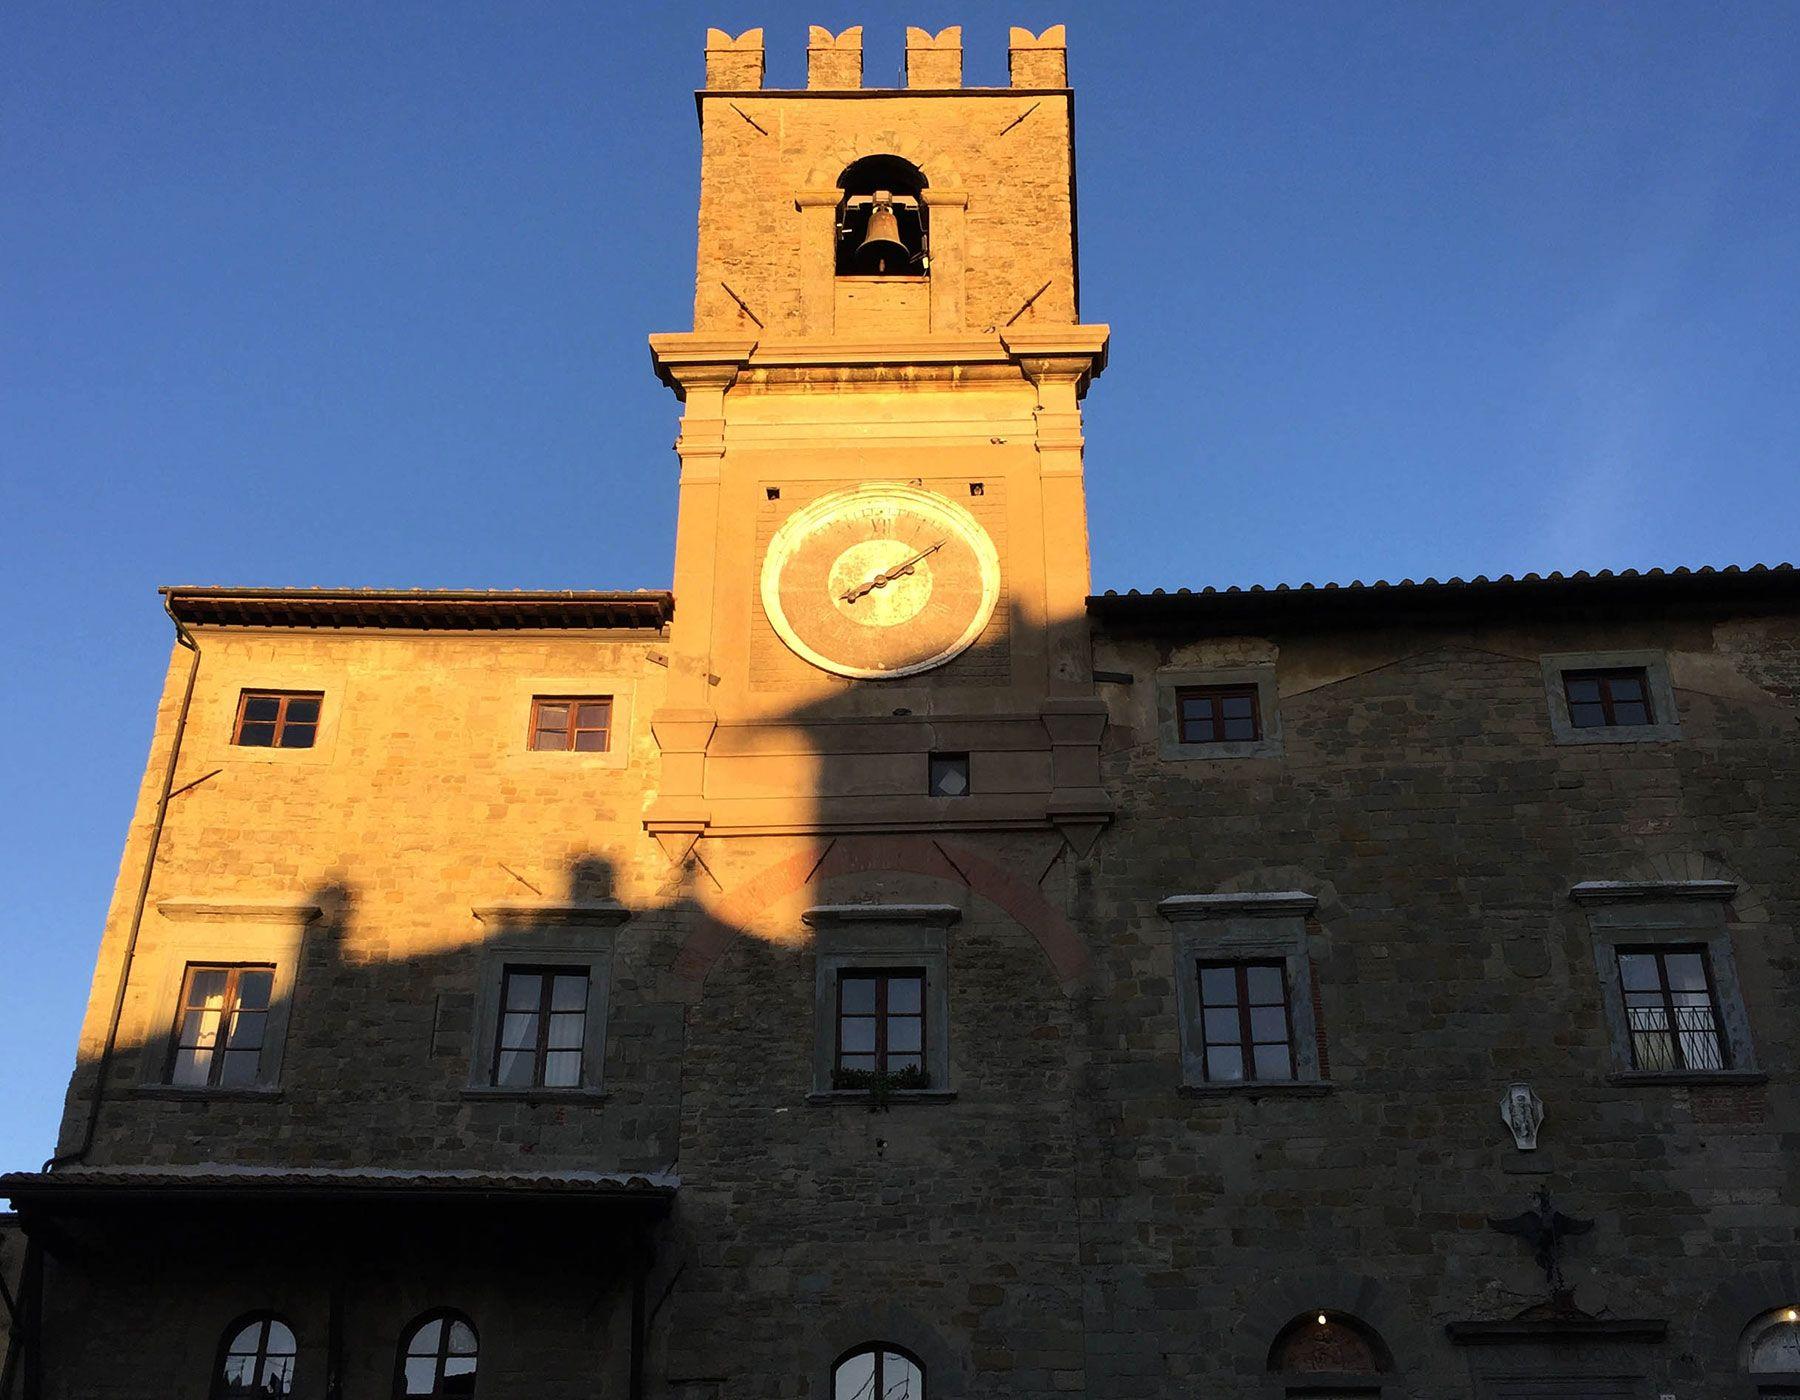 The Palazzo Comunale (1241) with its impressive clocktower is the heart of Cortona.